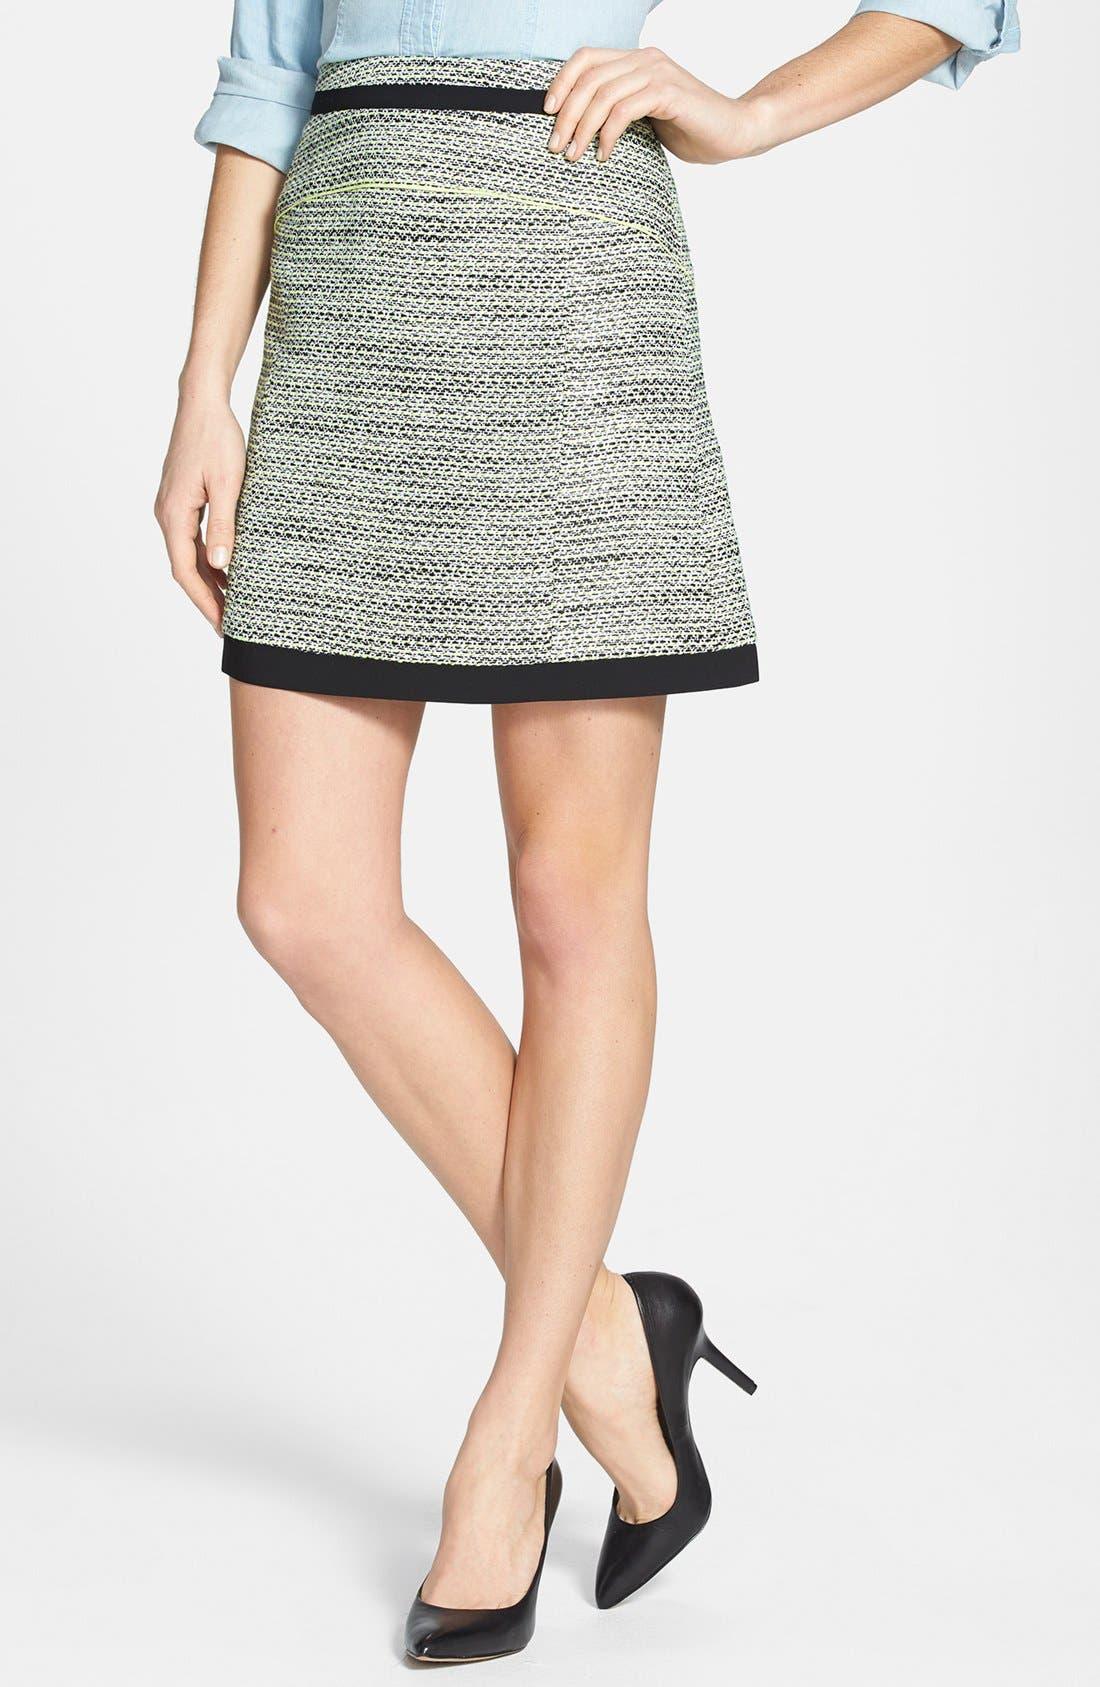 Alternate Image 1 Selected - Halogen® 'Exotic Tweed' A-Line Skirt